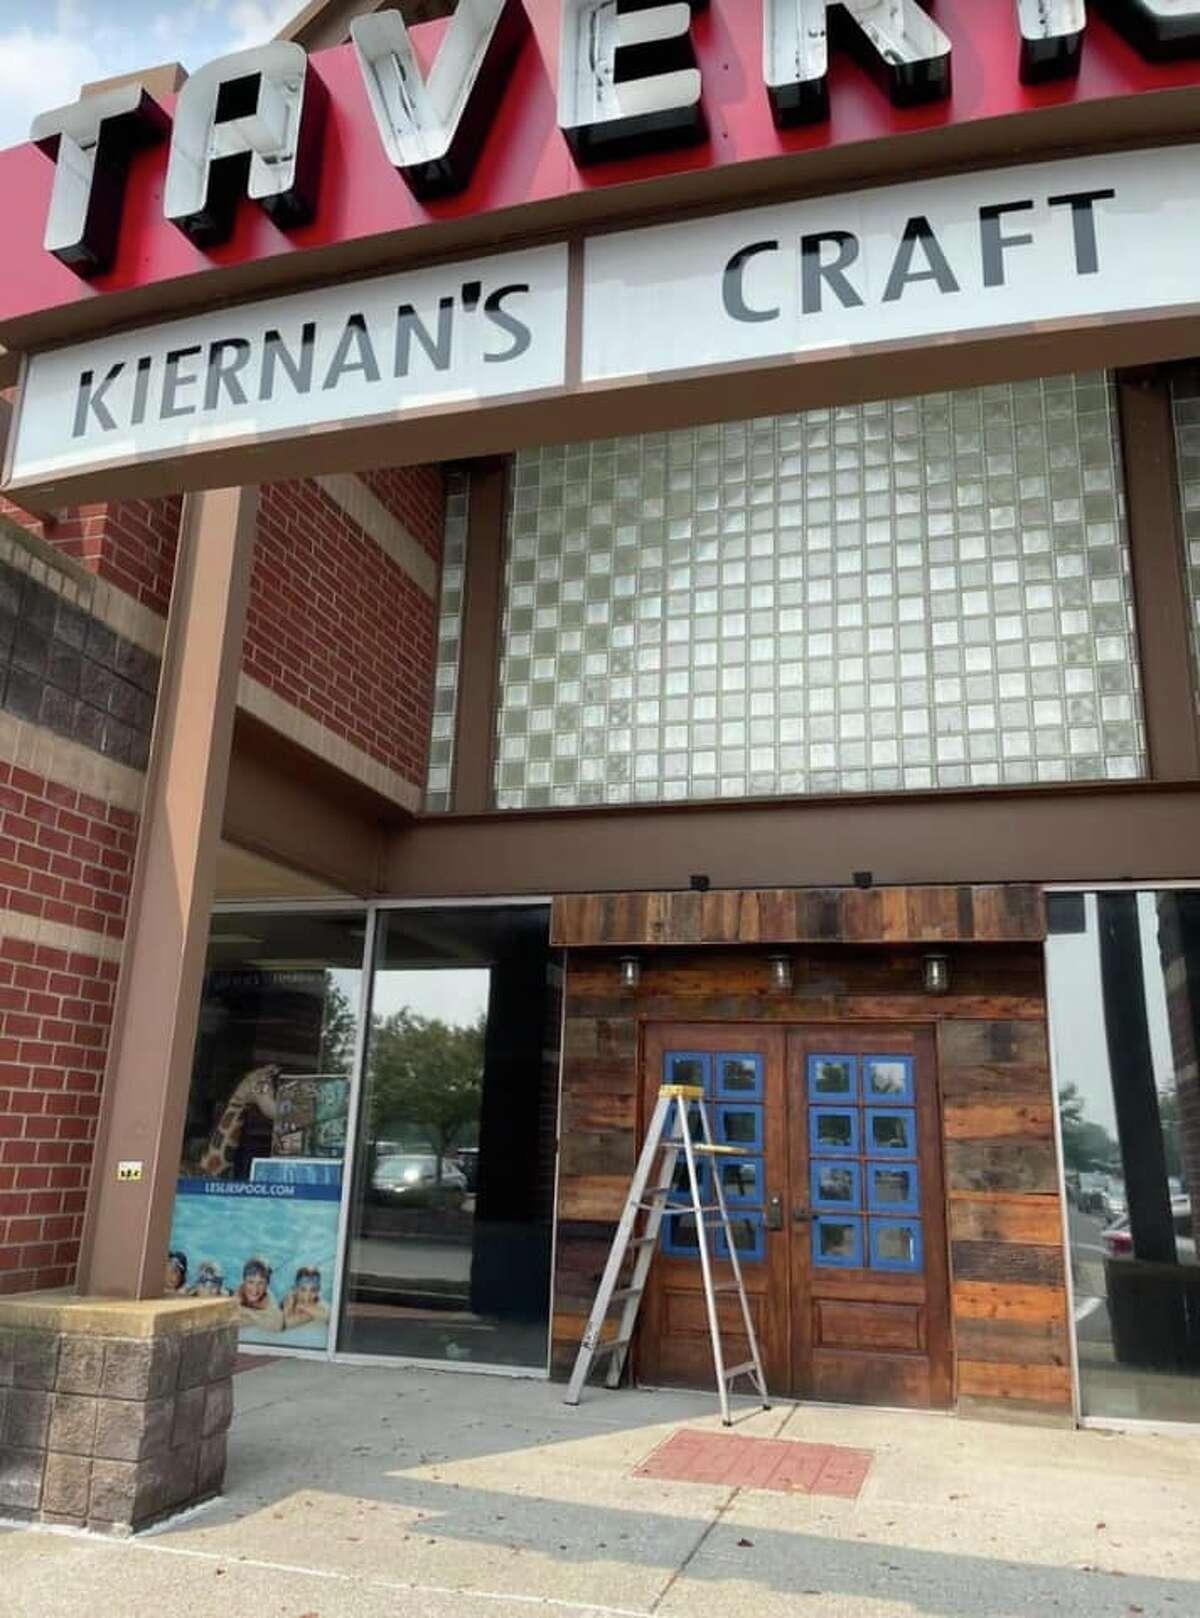 Kiernan's Craft Tavern in Latham.